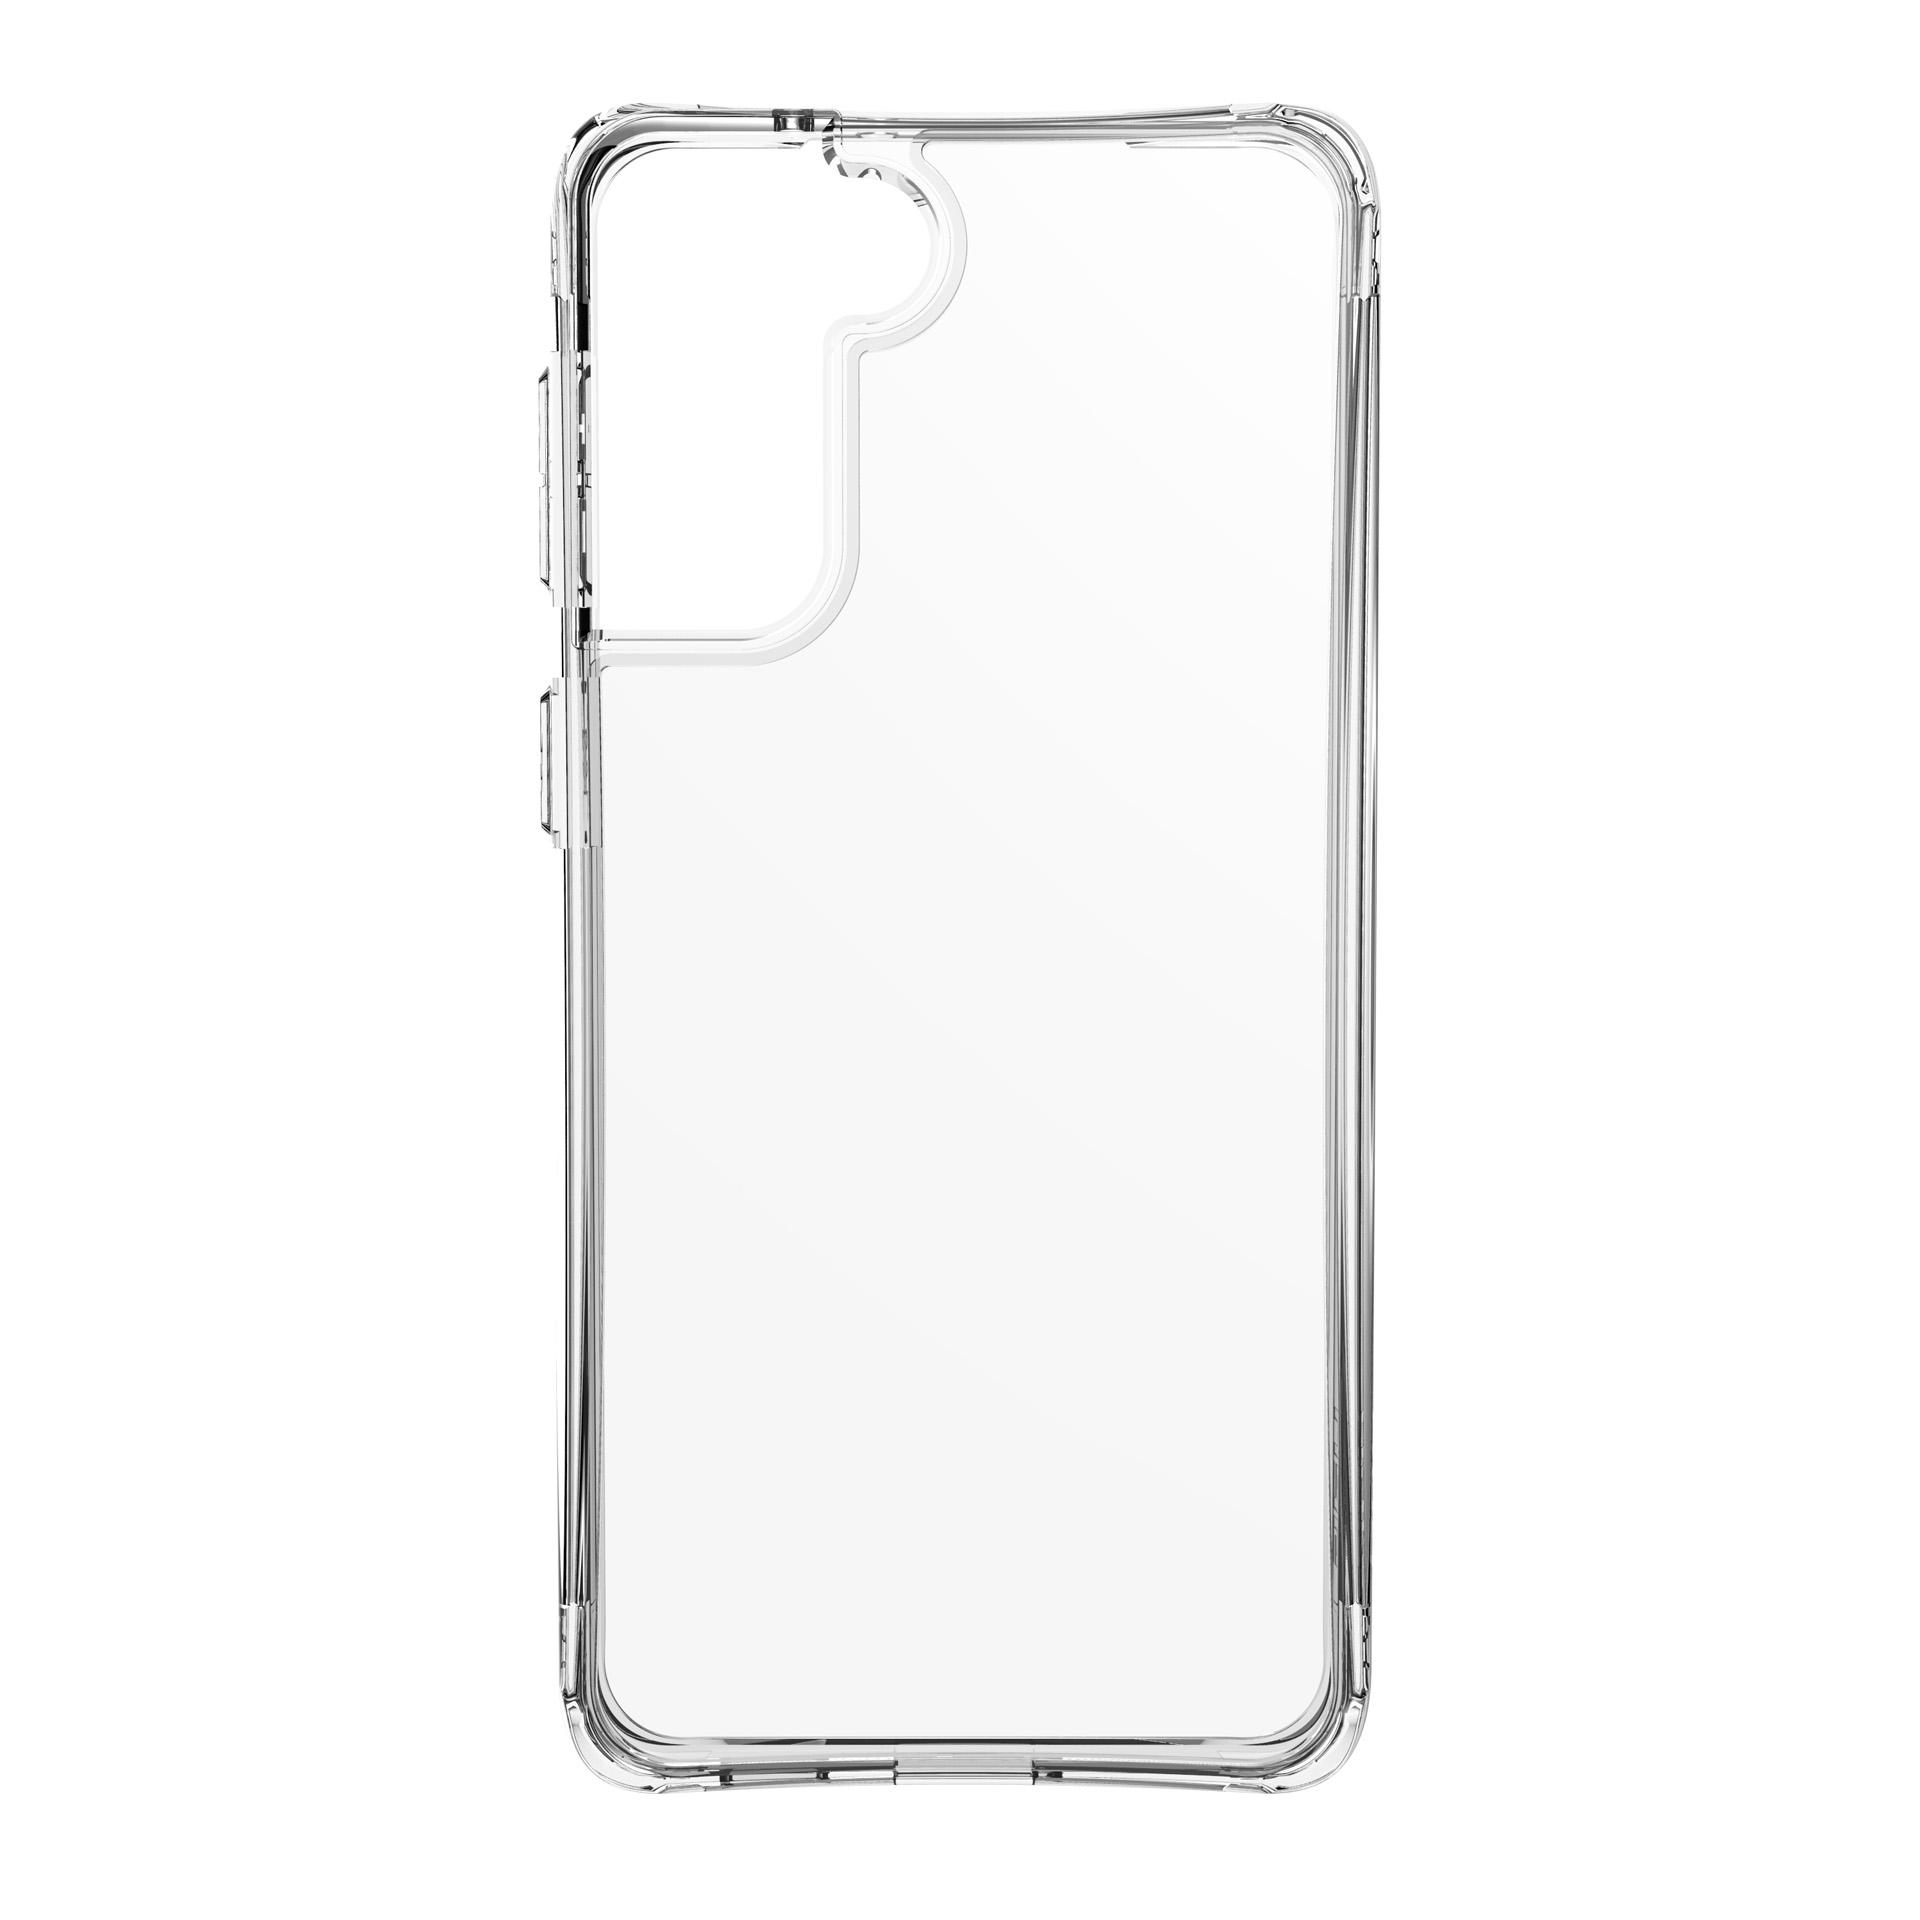 Samsung Galaxy S21 Plus UAG Plyo Case Ice 212822114343 image